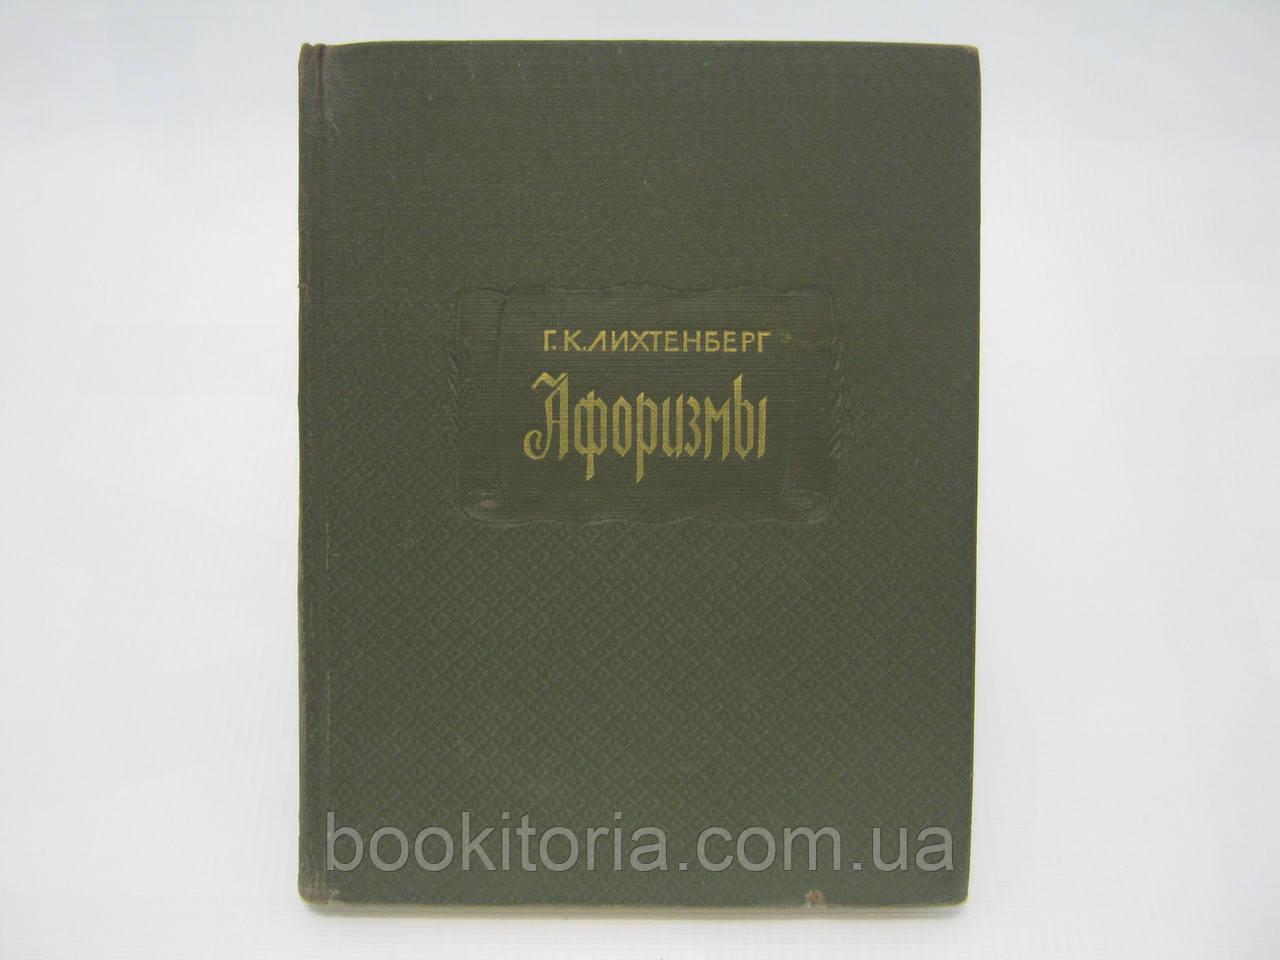 Лихтенберг Г.К. Афоризмы (б/у).